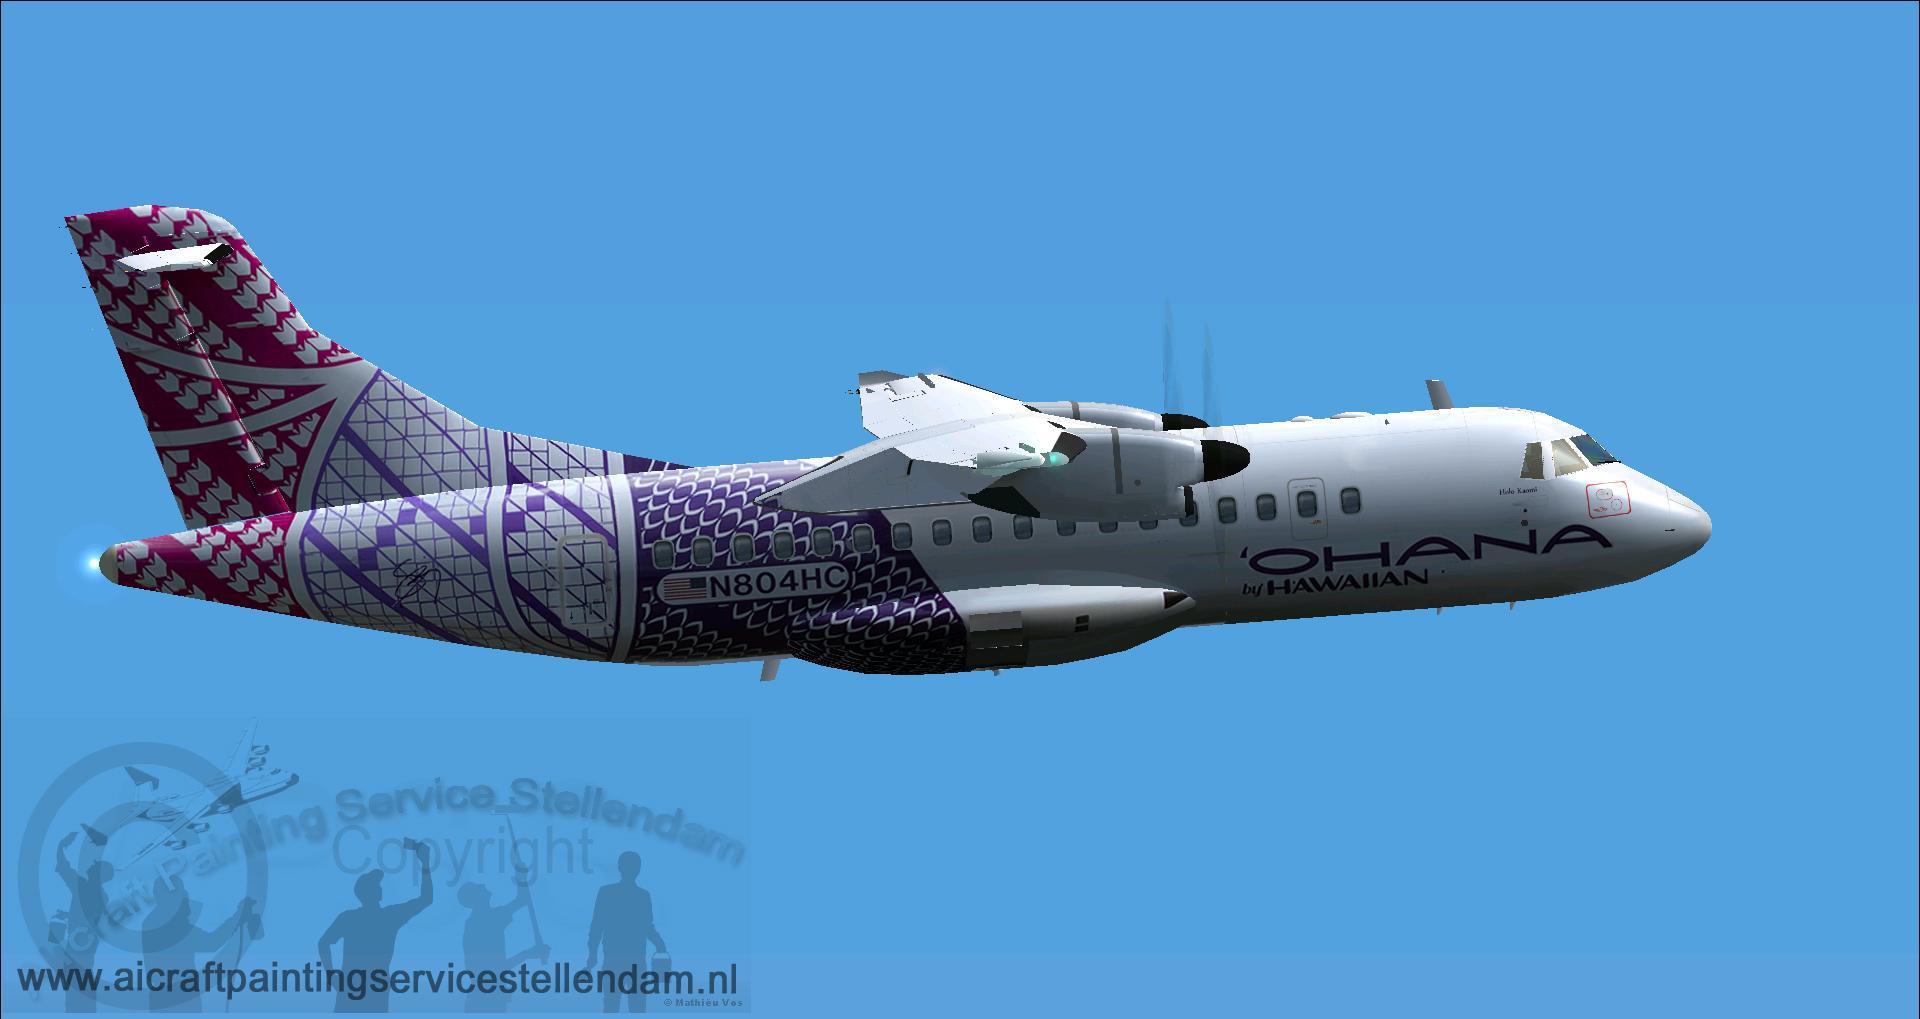 ISDT_ATR42-500_Ohana_by_Hawaiian_N804HC3